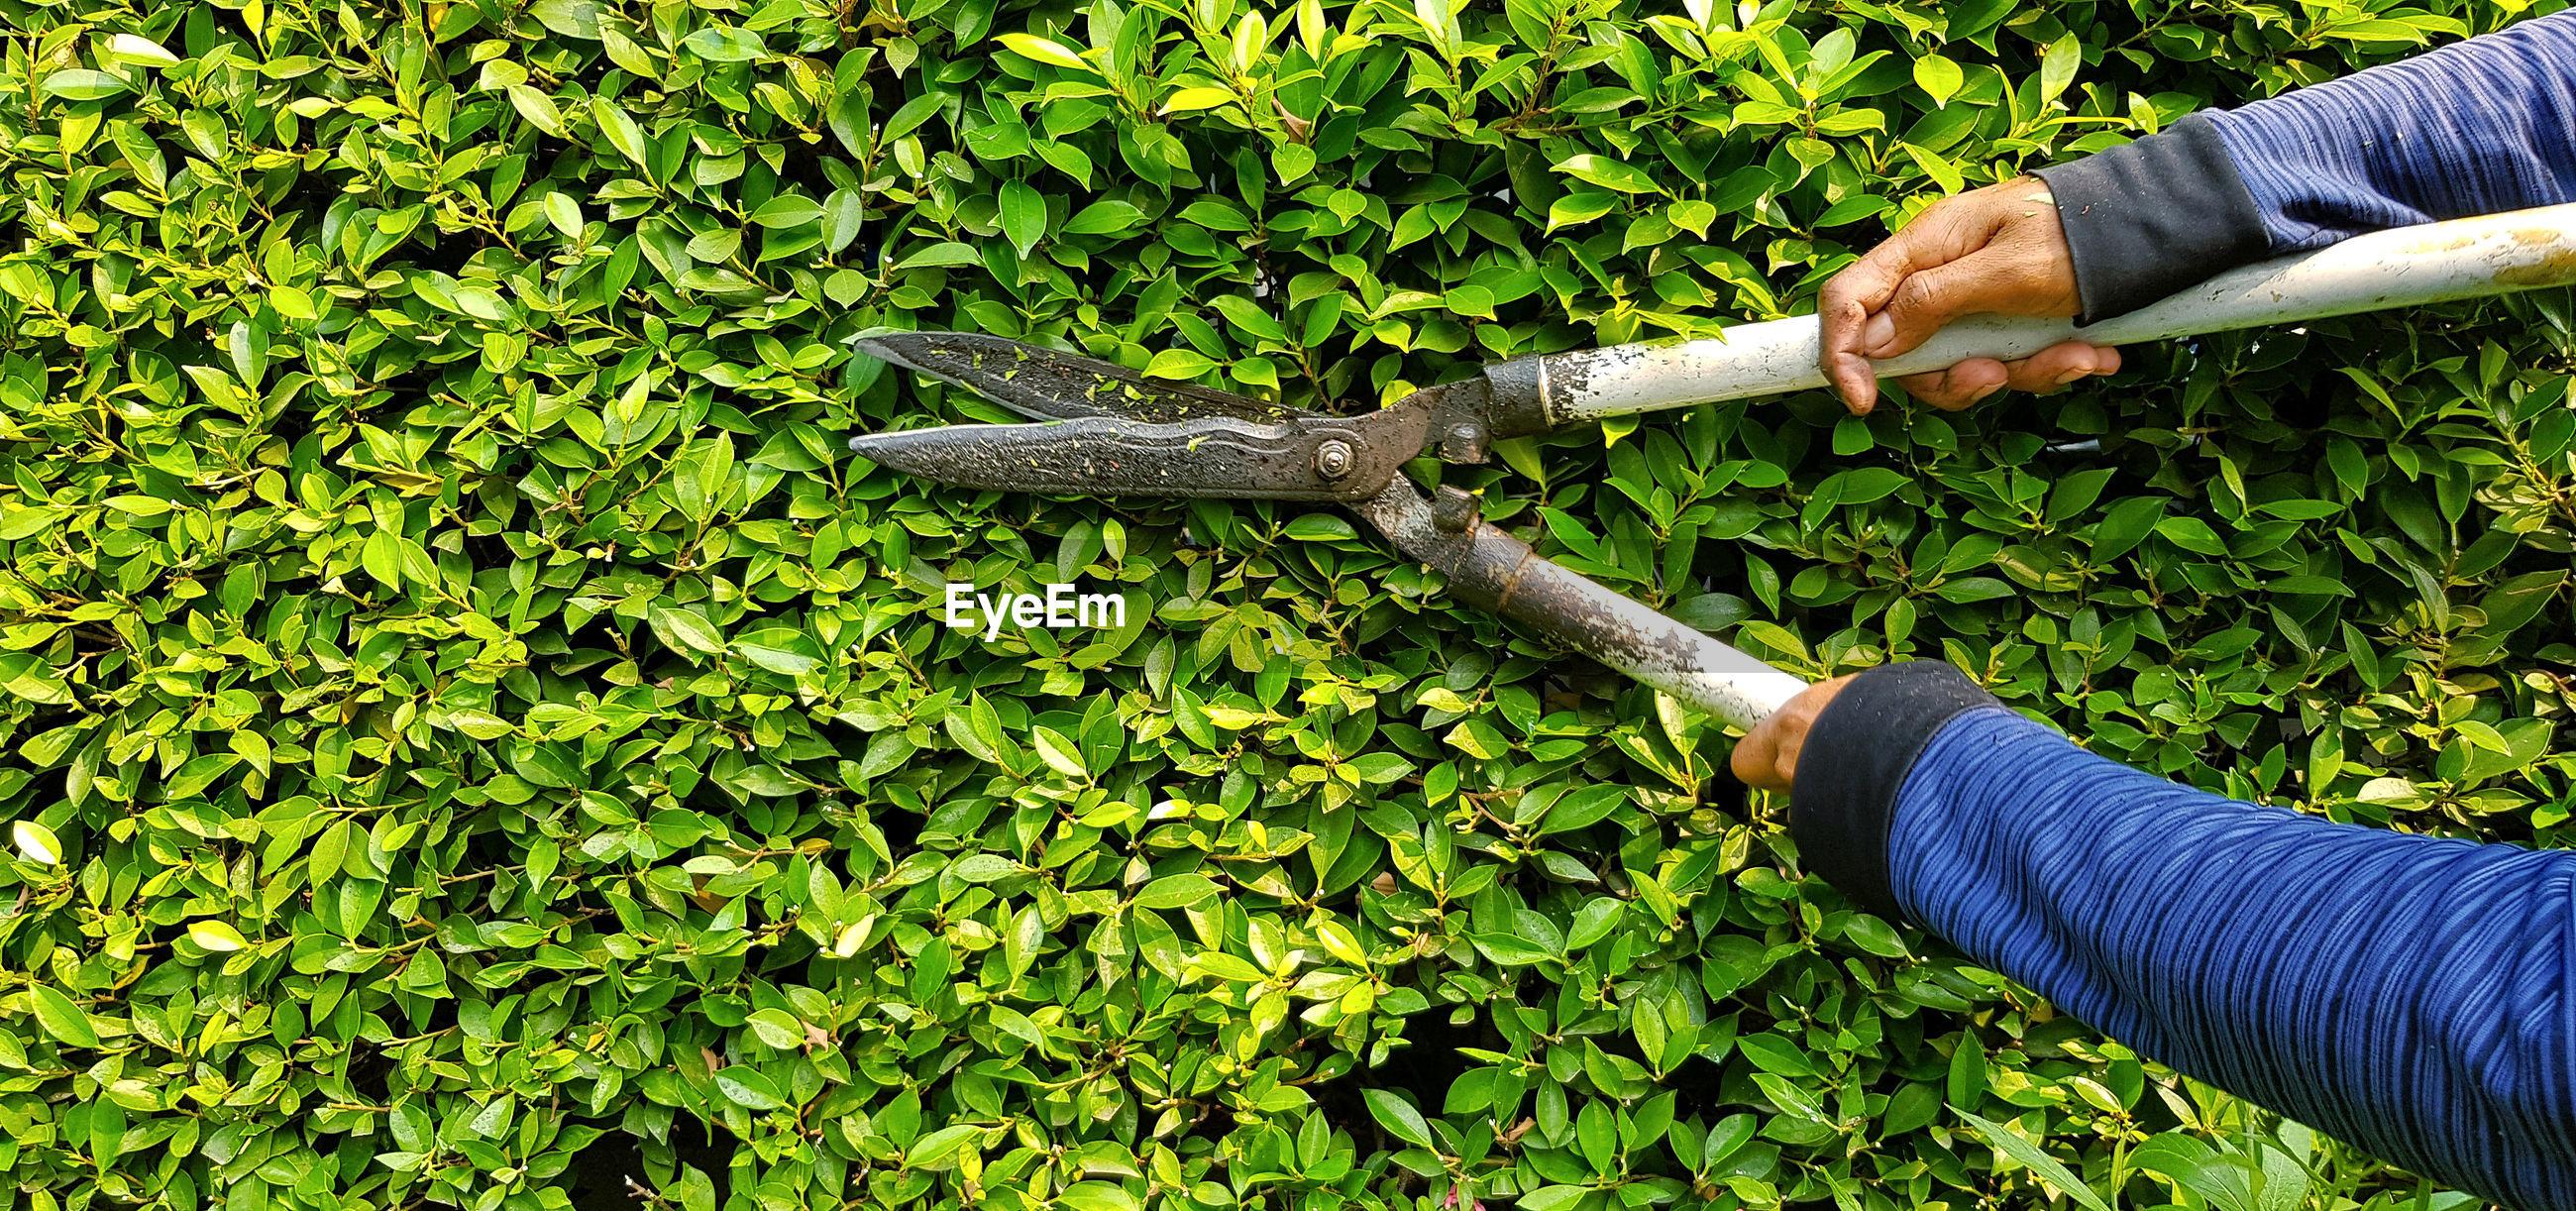 Cutting green leaves